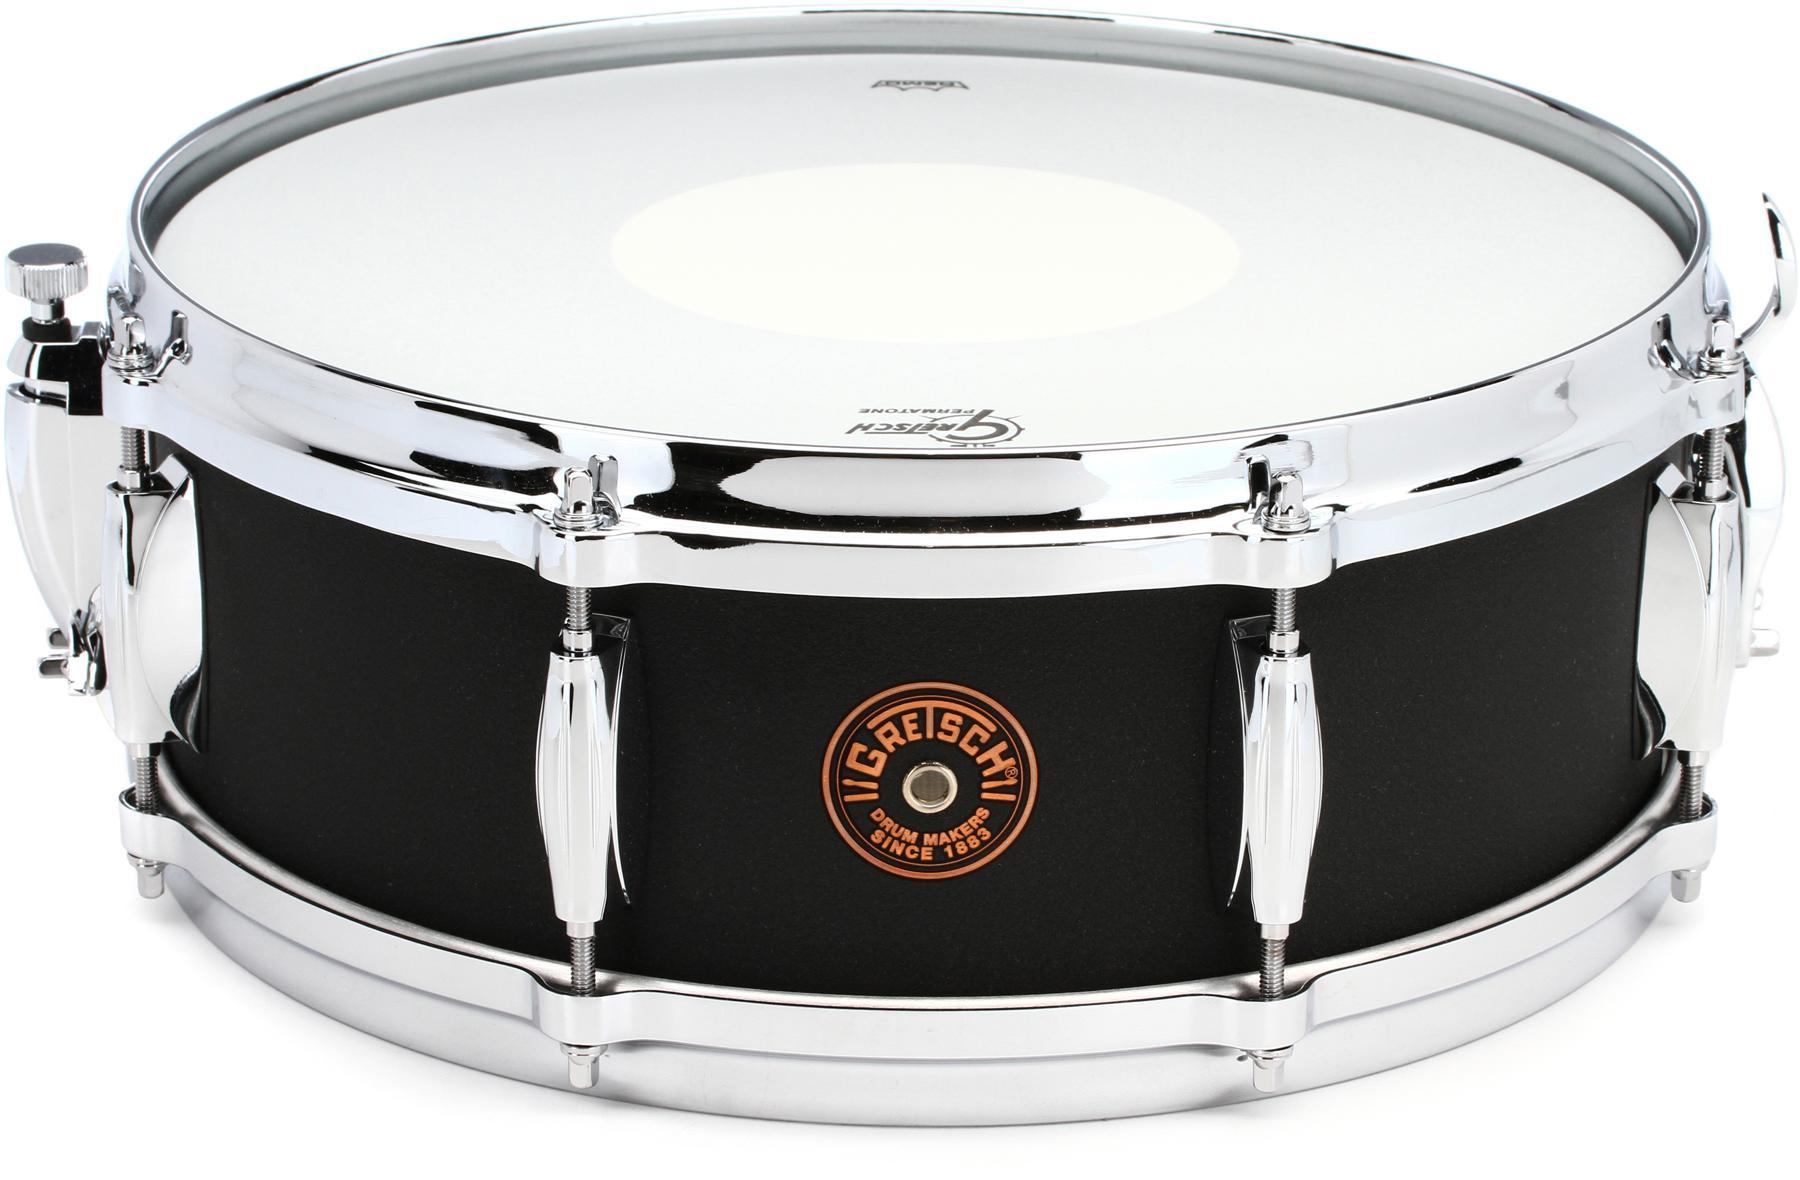 9. Gretsch Drums – Black Copper Snare 14 x 5 in